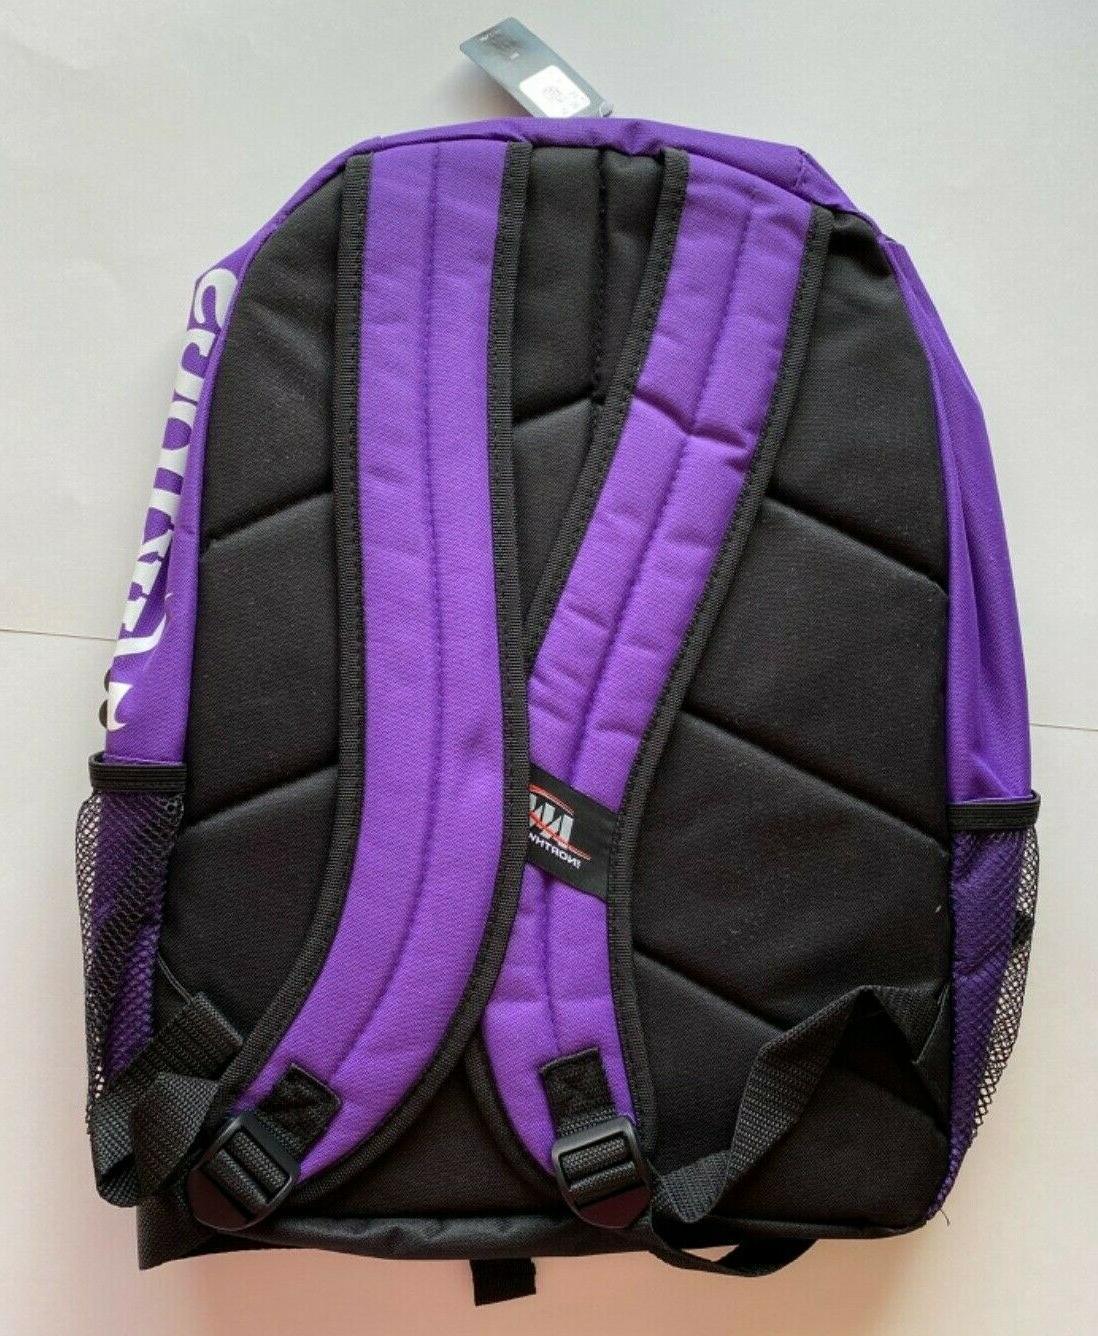 Minnesota Backpack Style Carry On Bag